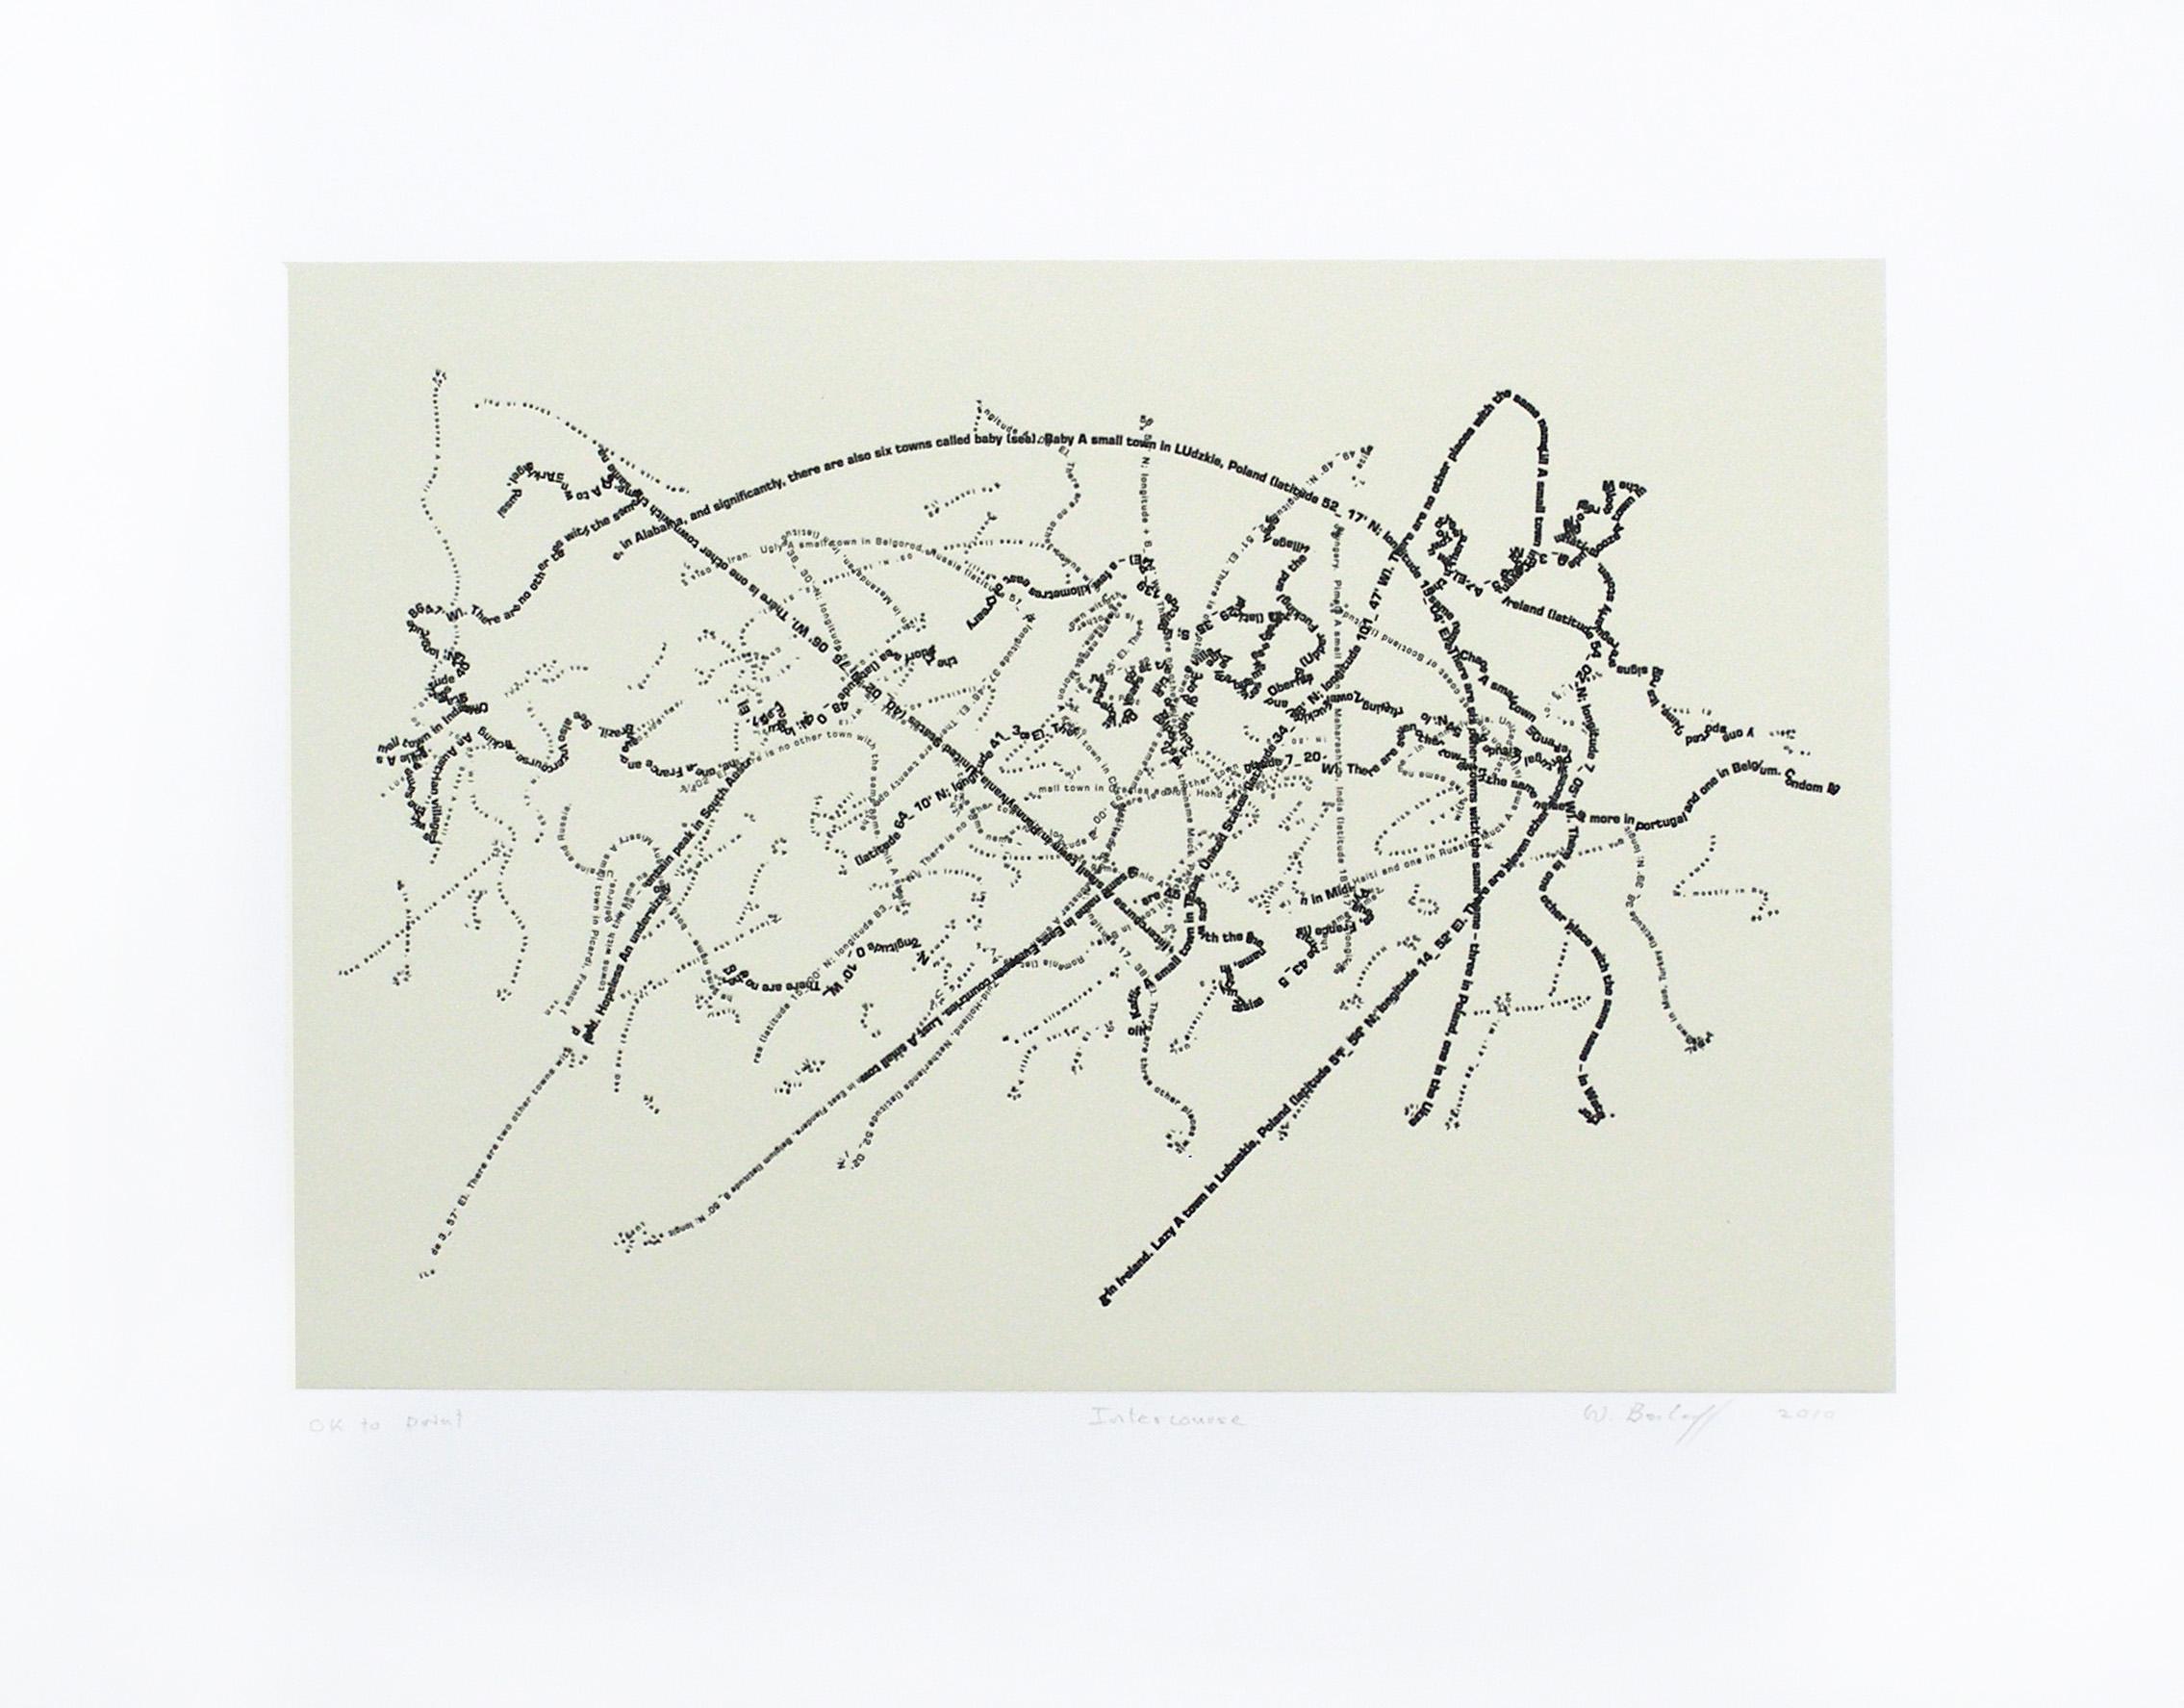 Willem Boshoff_Intercourse_Chine collé letterpress_29.7x42cm edof35.jpg